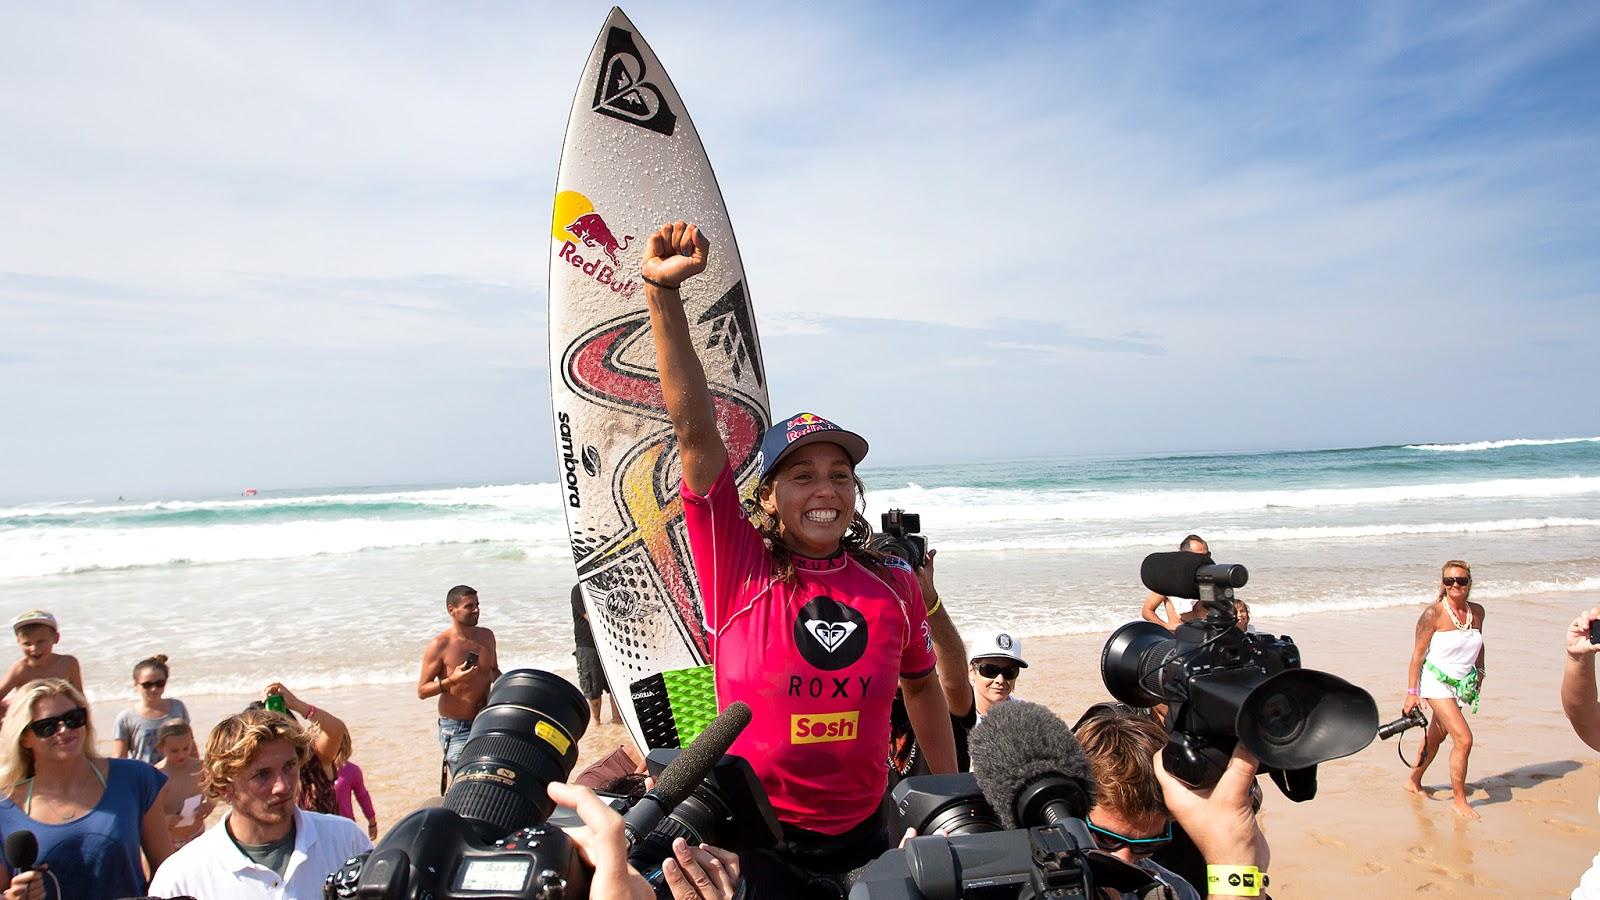 Sally Fitzgibbons Austrailian Surfer Wide Hd Wallpape Qhd